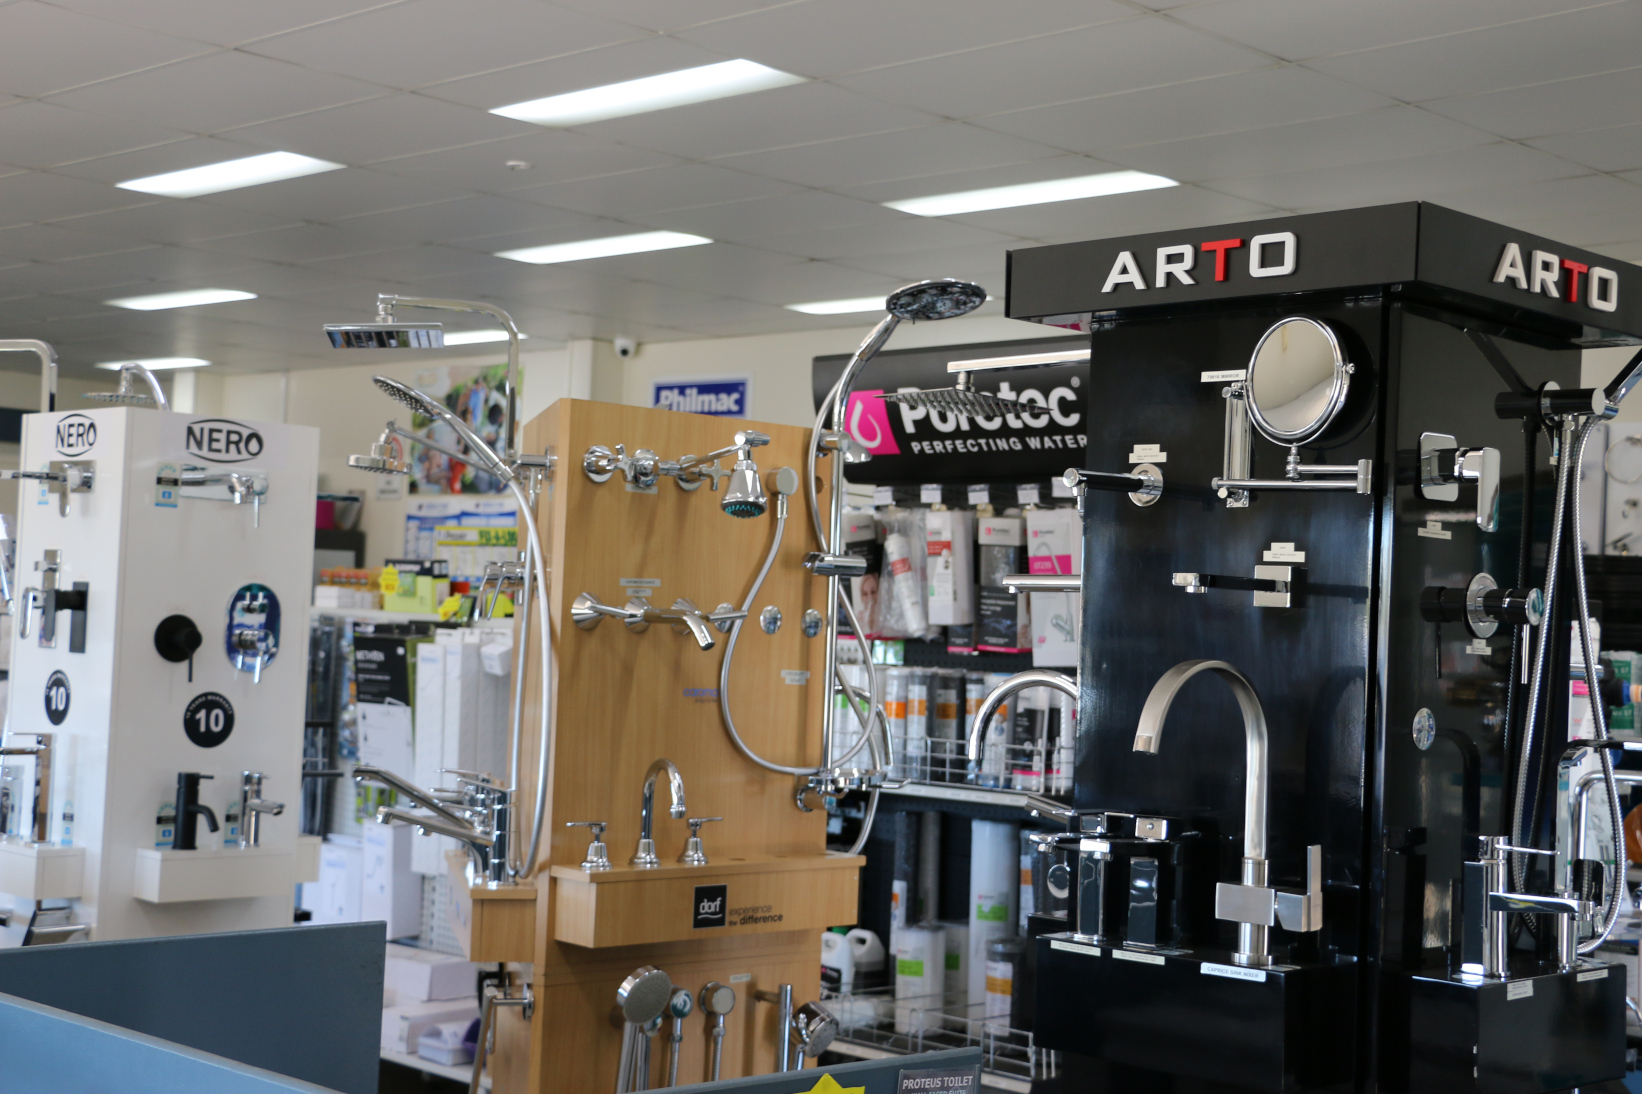 bathroom plumbing supplies in our large modern showroom